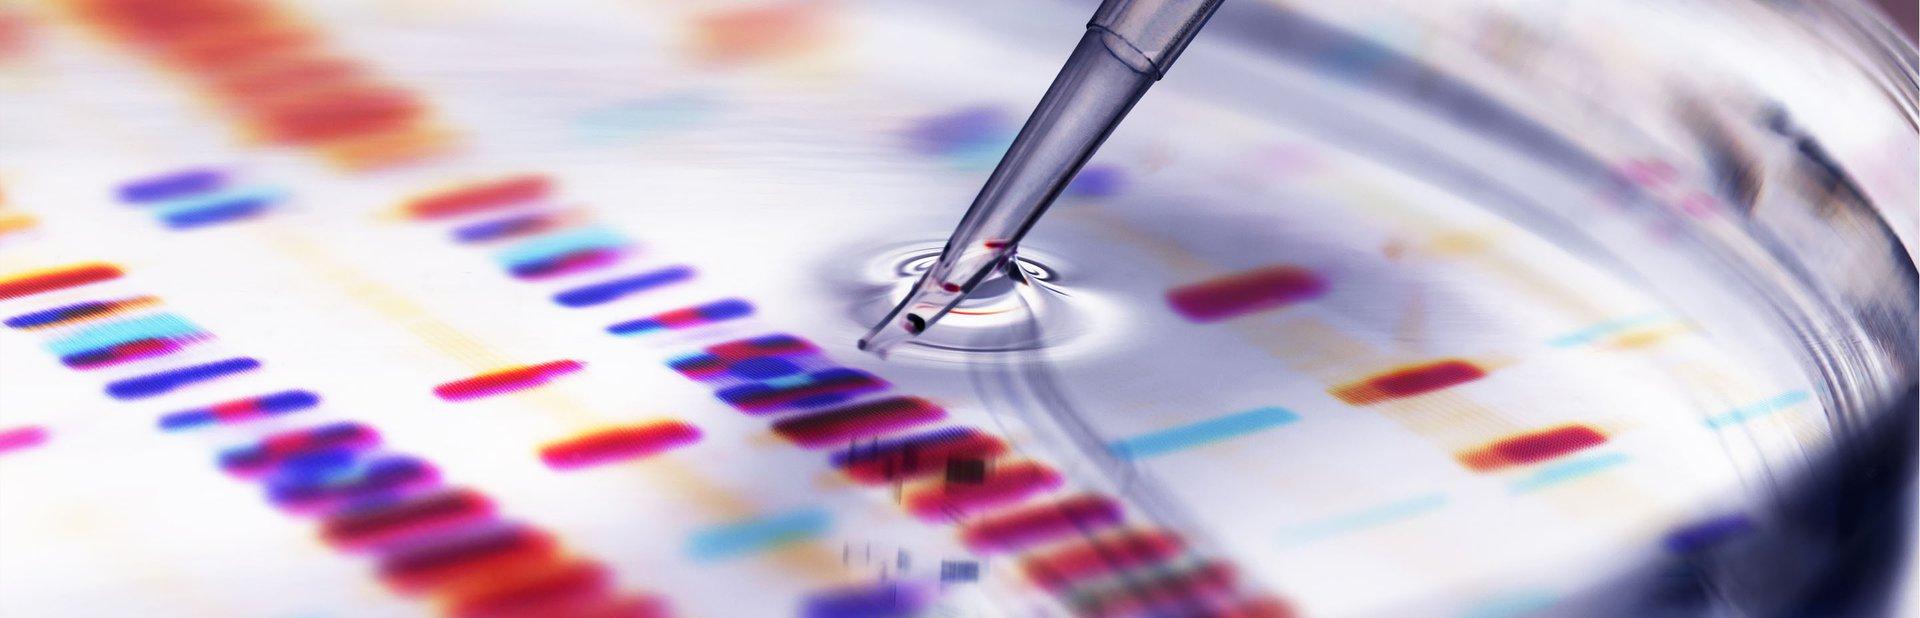 Cabecera Biomedicina